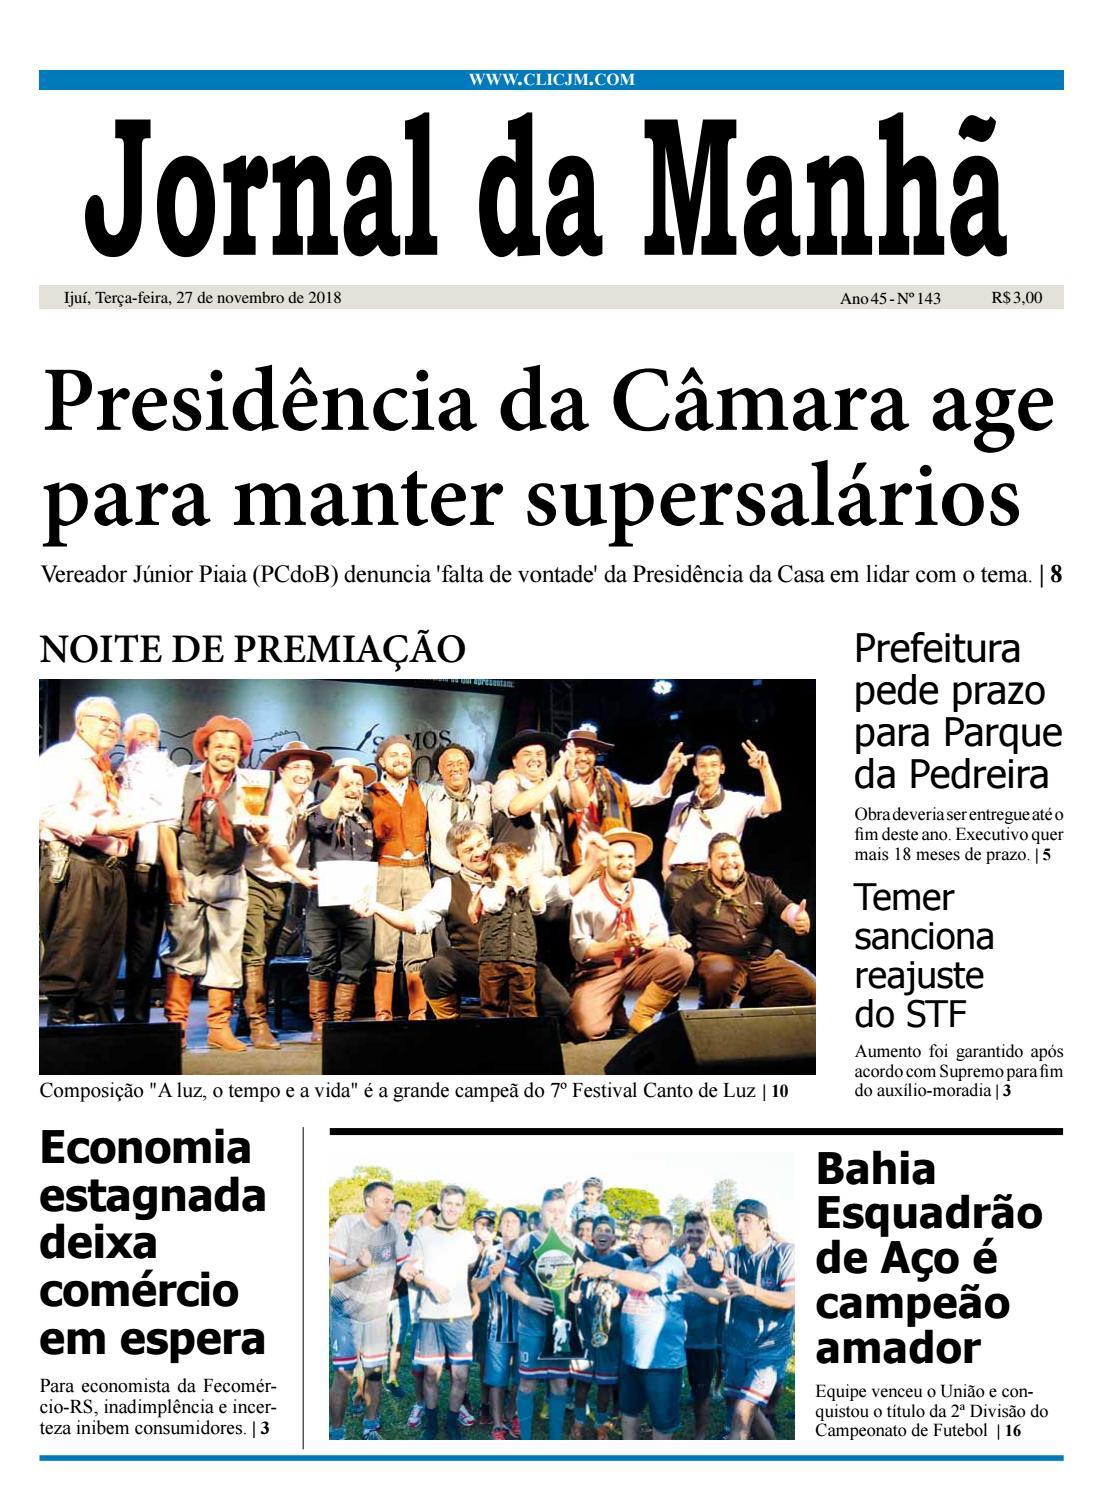 bffa53514cace Jornal da Manhã - Terça-feira - 27-11-2018 by clicjm - issuu